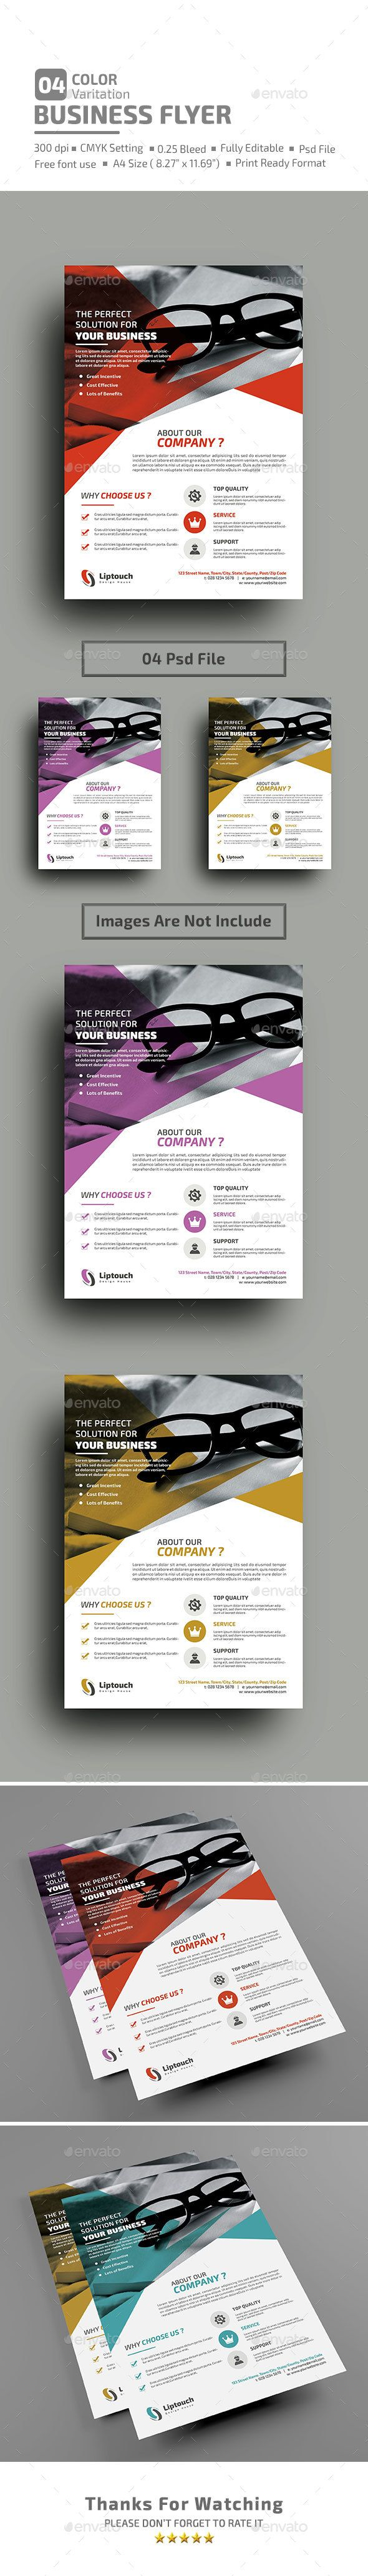 Multipurpose Business Flyer Template PSD